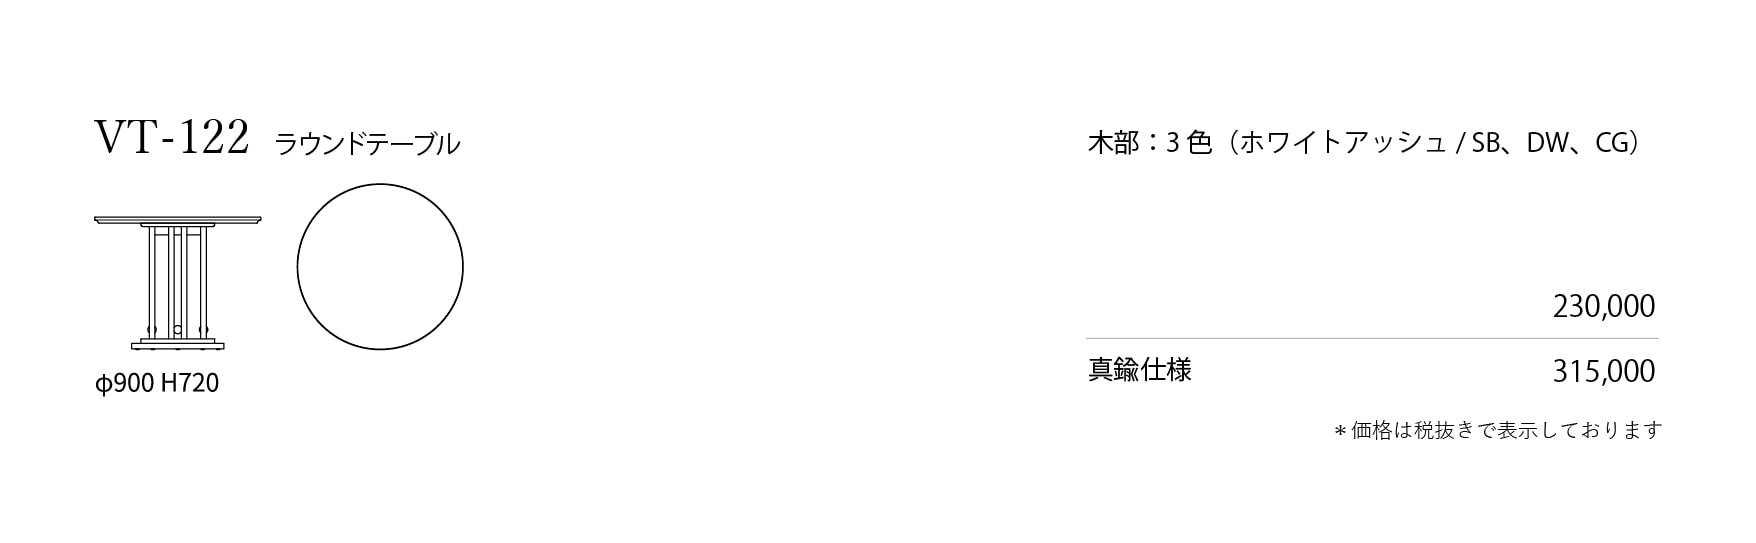 VT-122 Price List